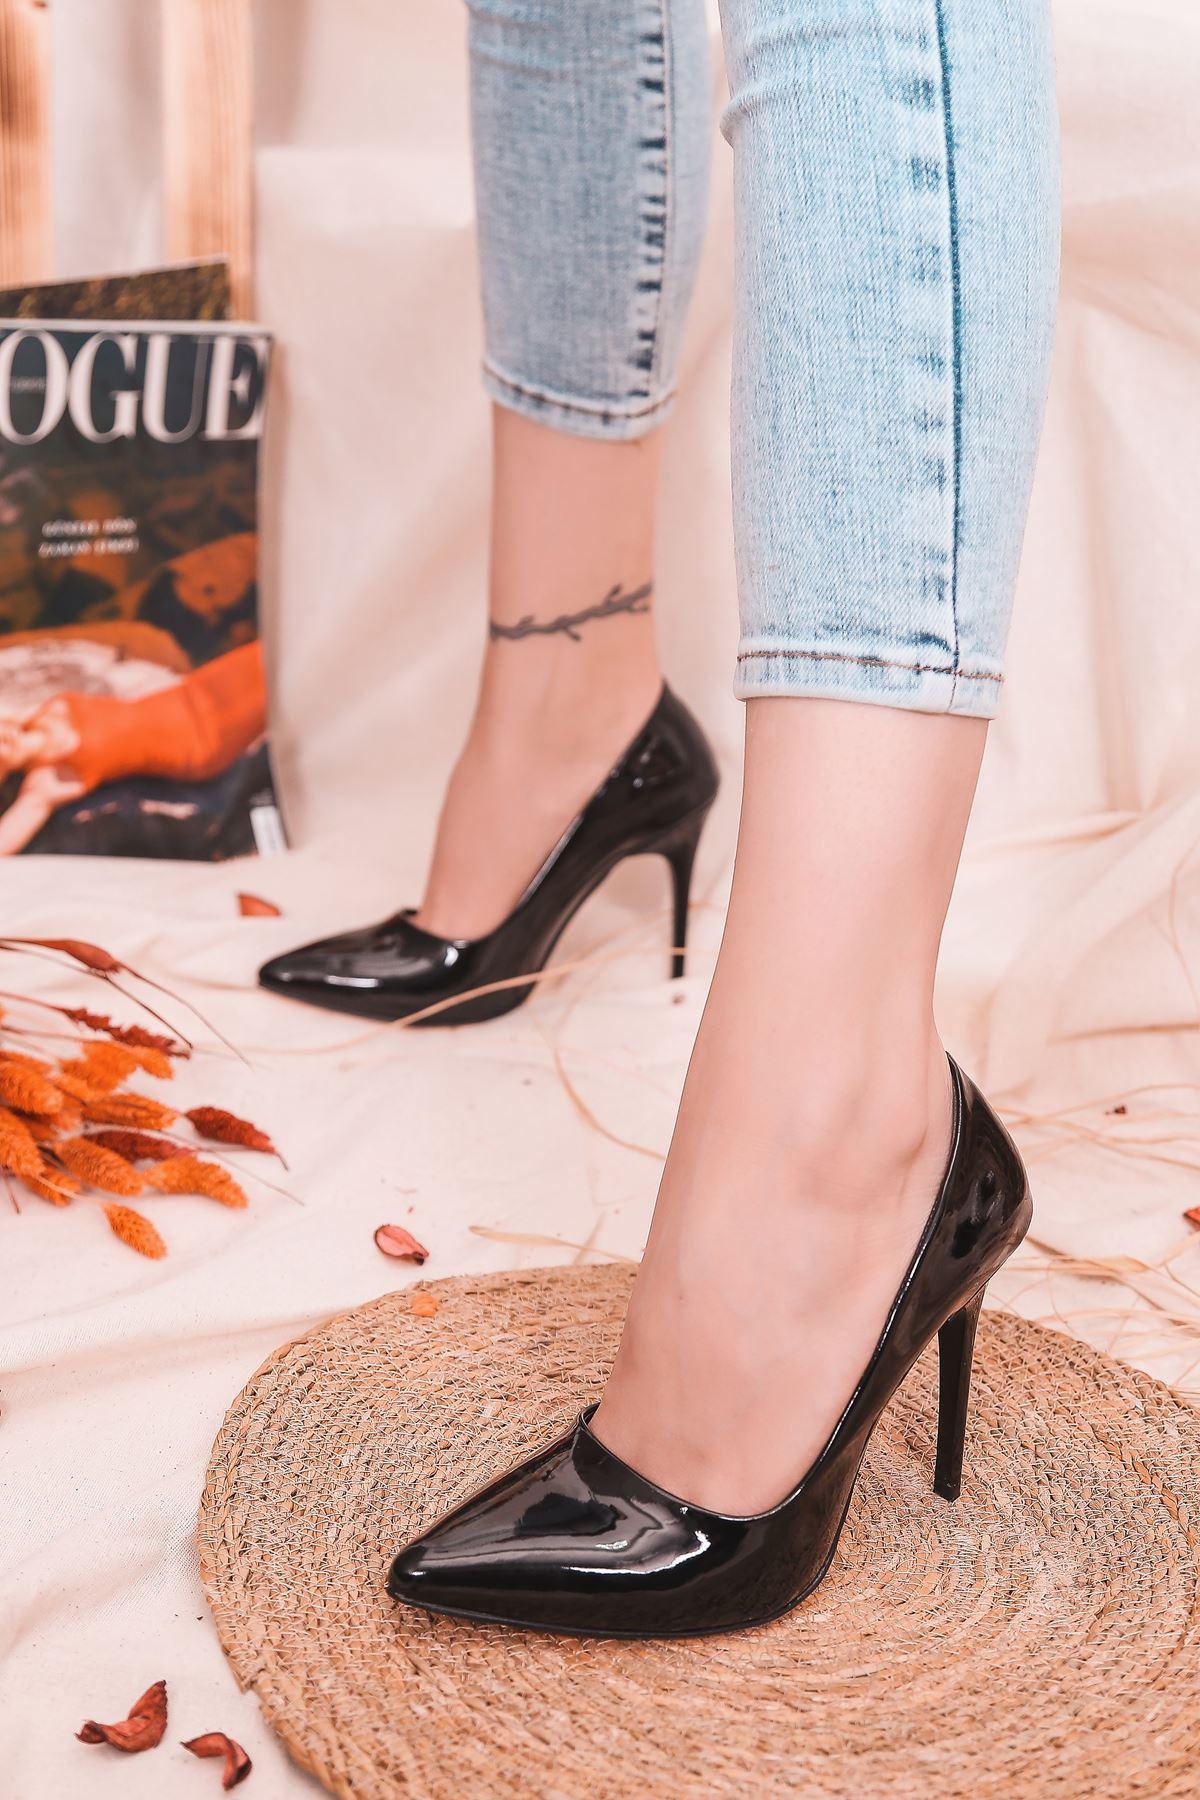 Ruha Yüksek Topuklu Siyah Rugan Kadın Stiletto